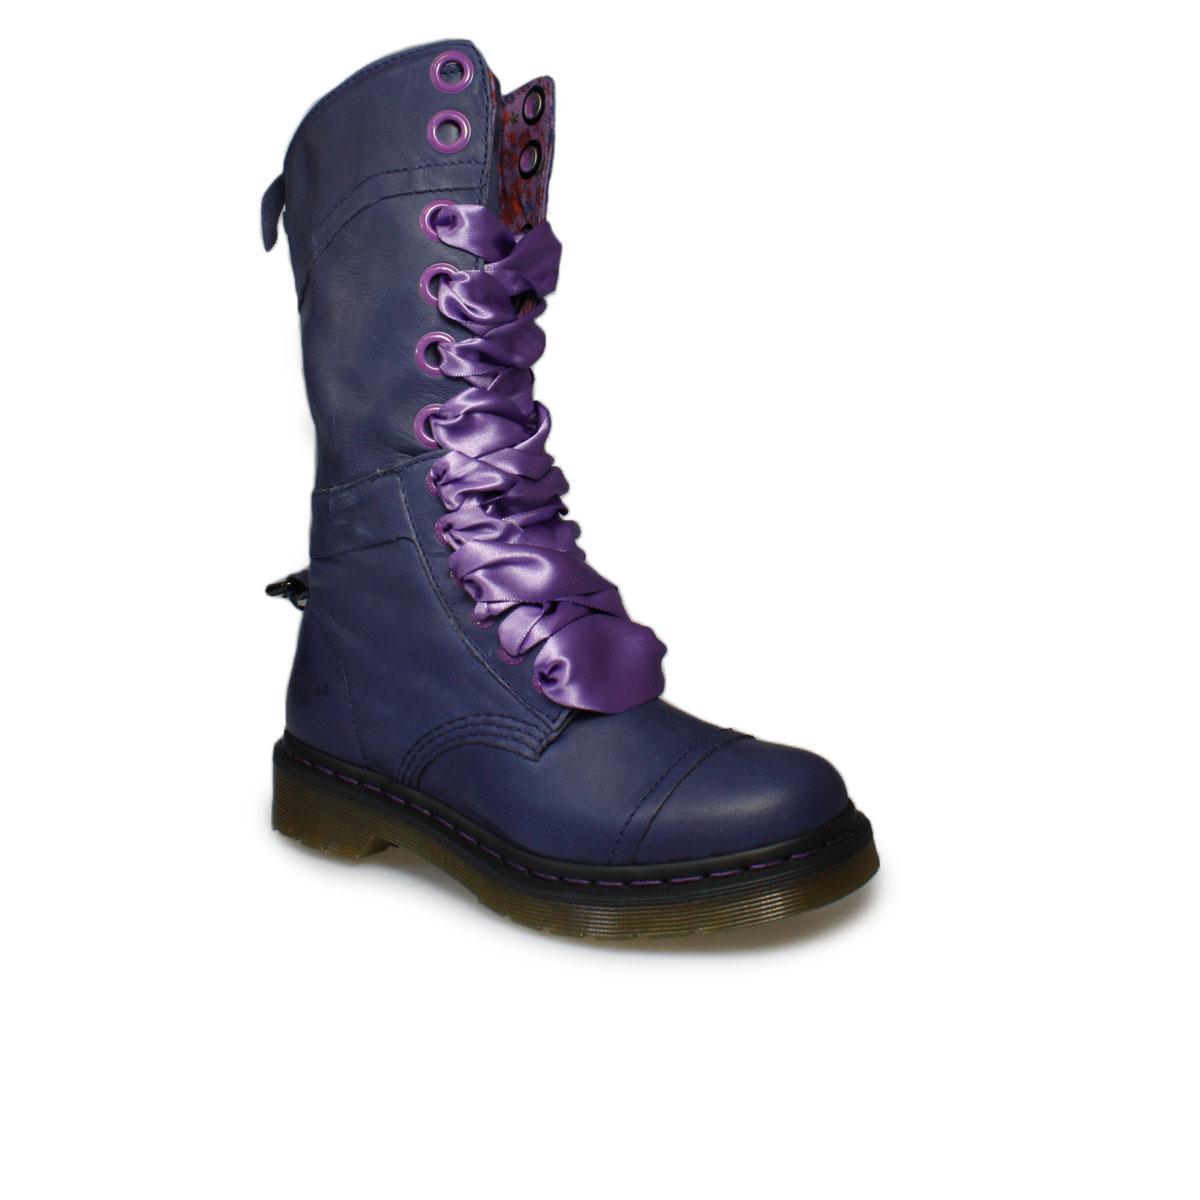 Dr Martens Triumph 1914 Navy Blue Leather Mid-Calf Boots ...